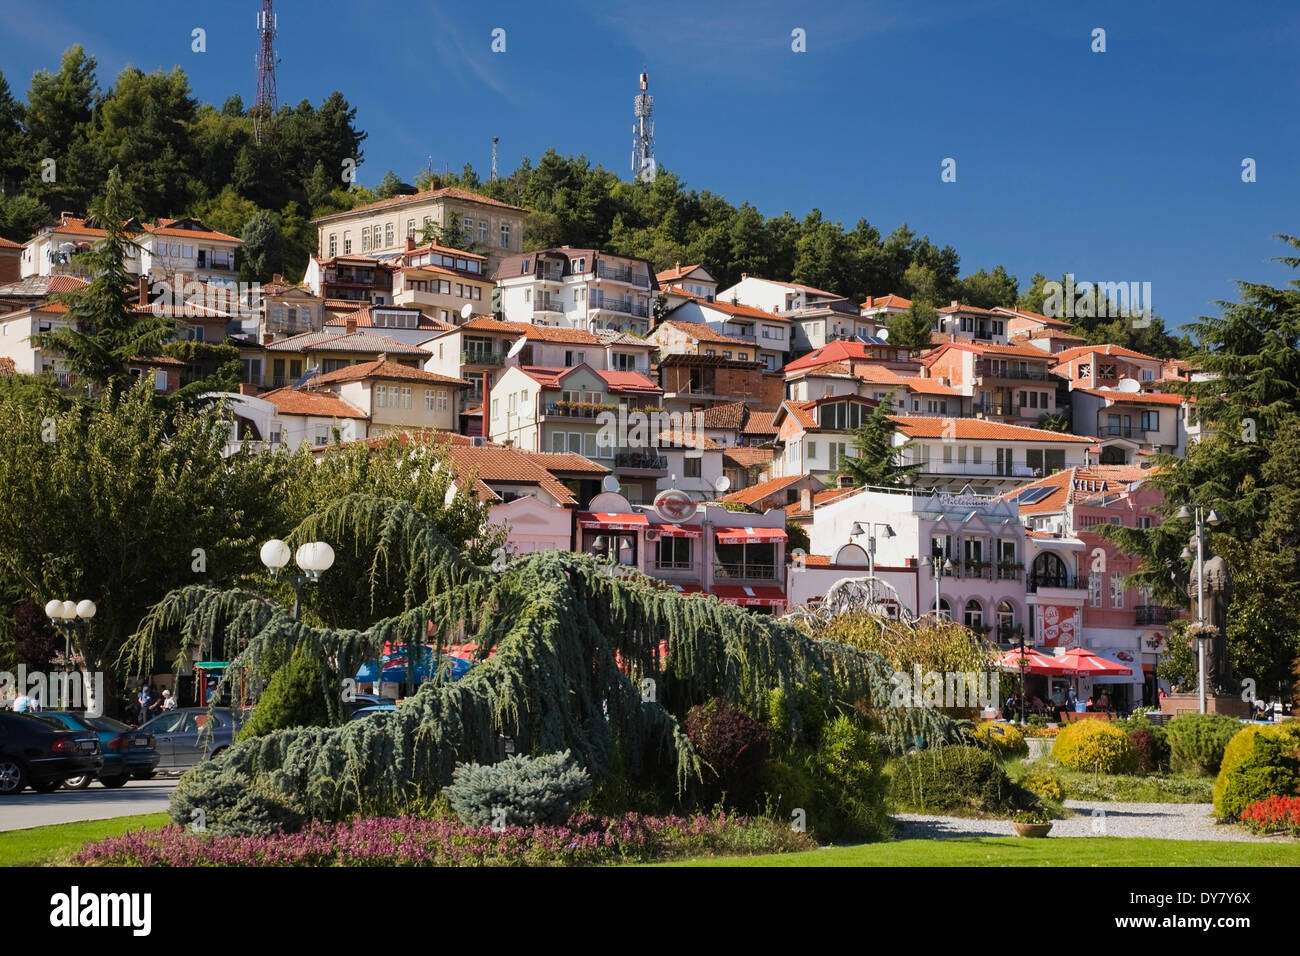 Residential buildings, Ohrid, Macedonia - Stock Image